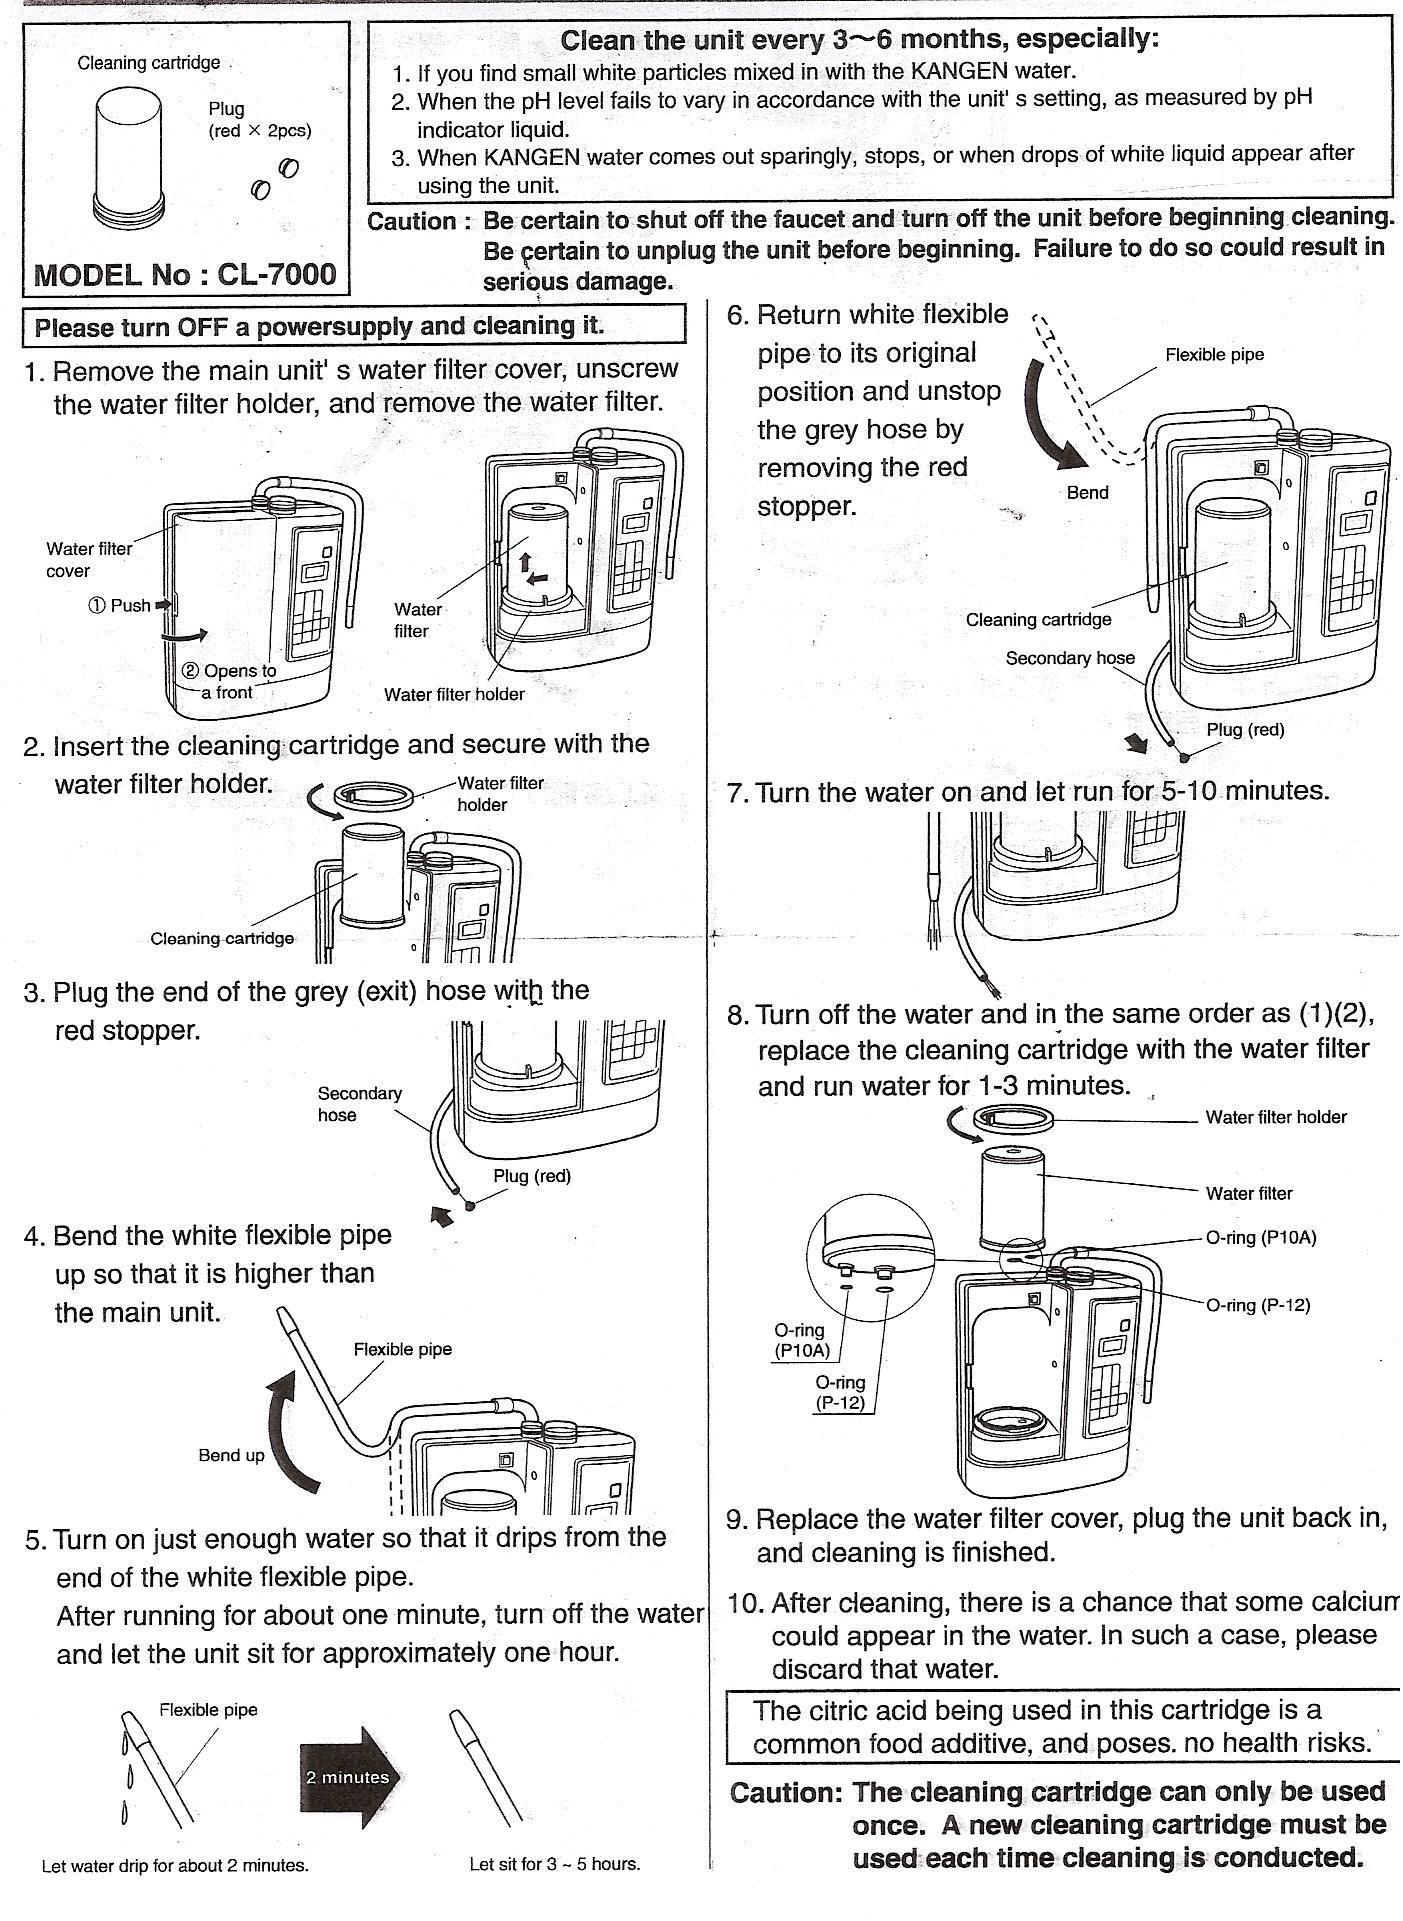 Leveluk Sd501 Kangen Water Compatible Mw 7000hg Hgn